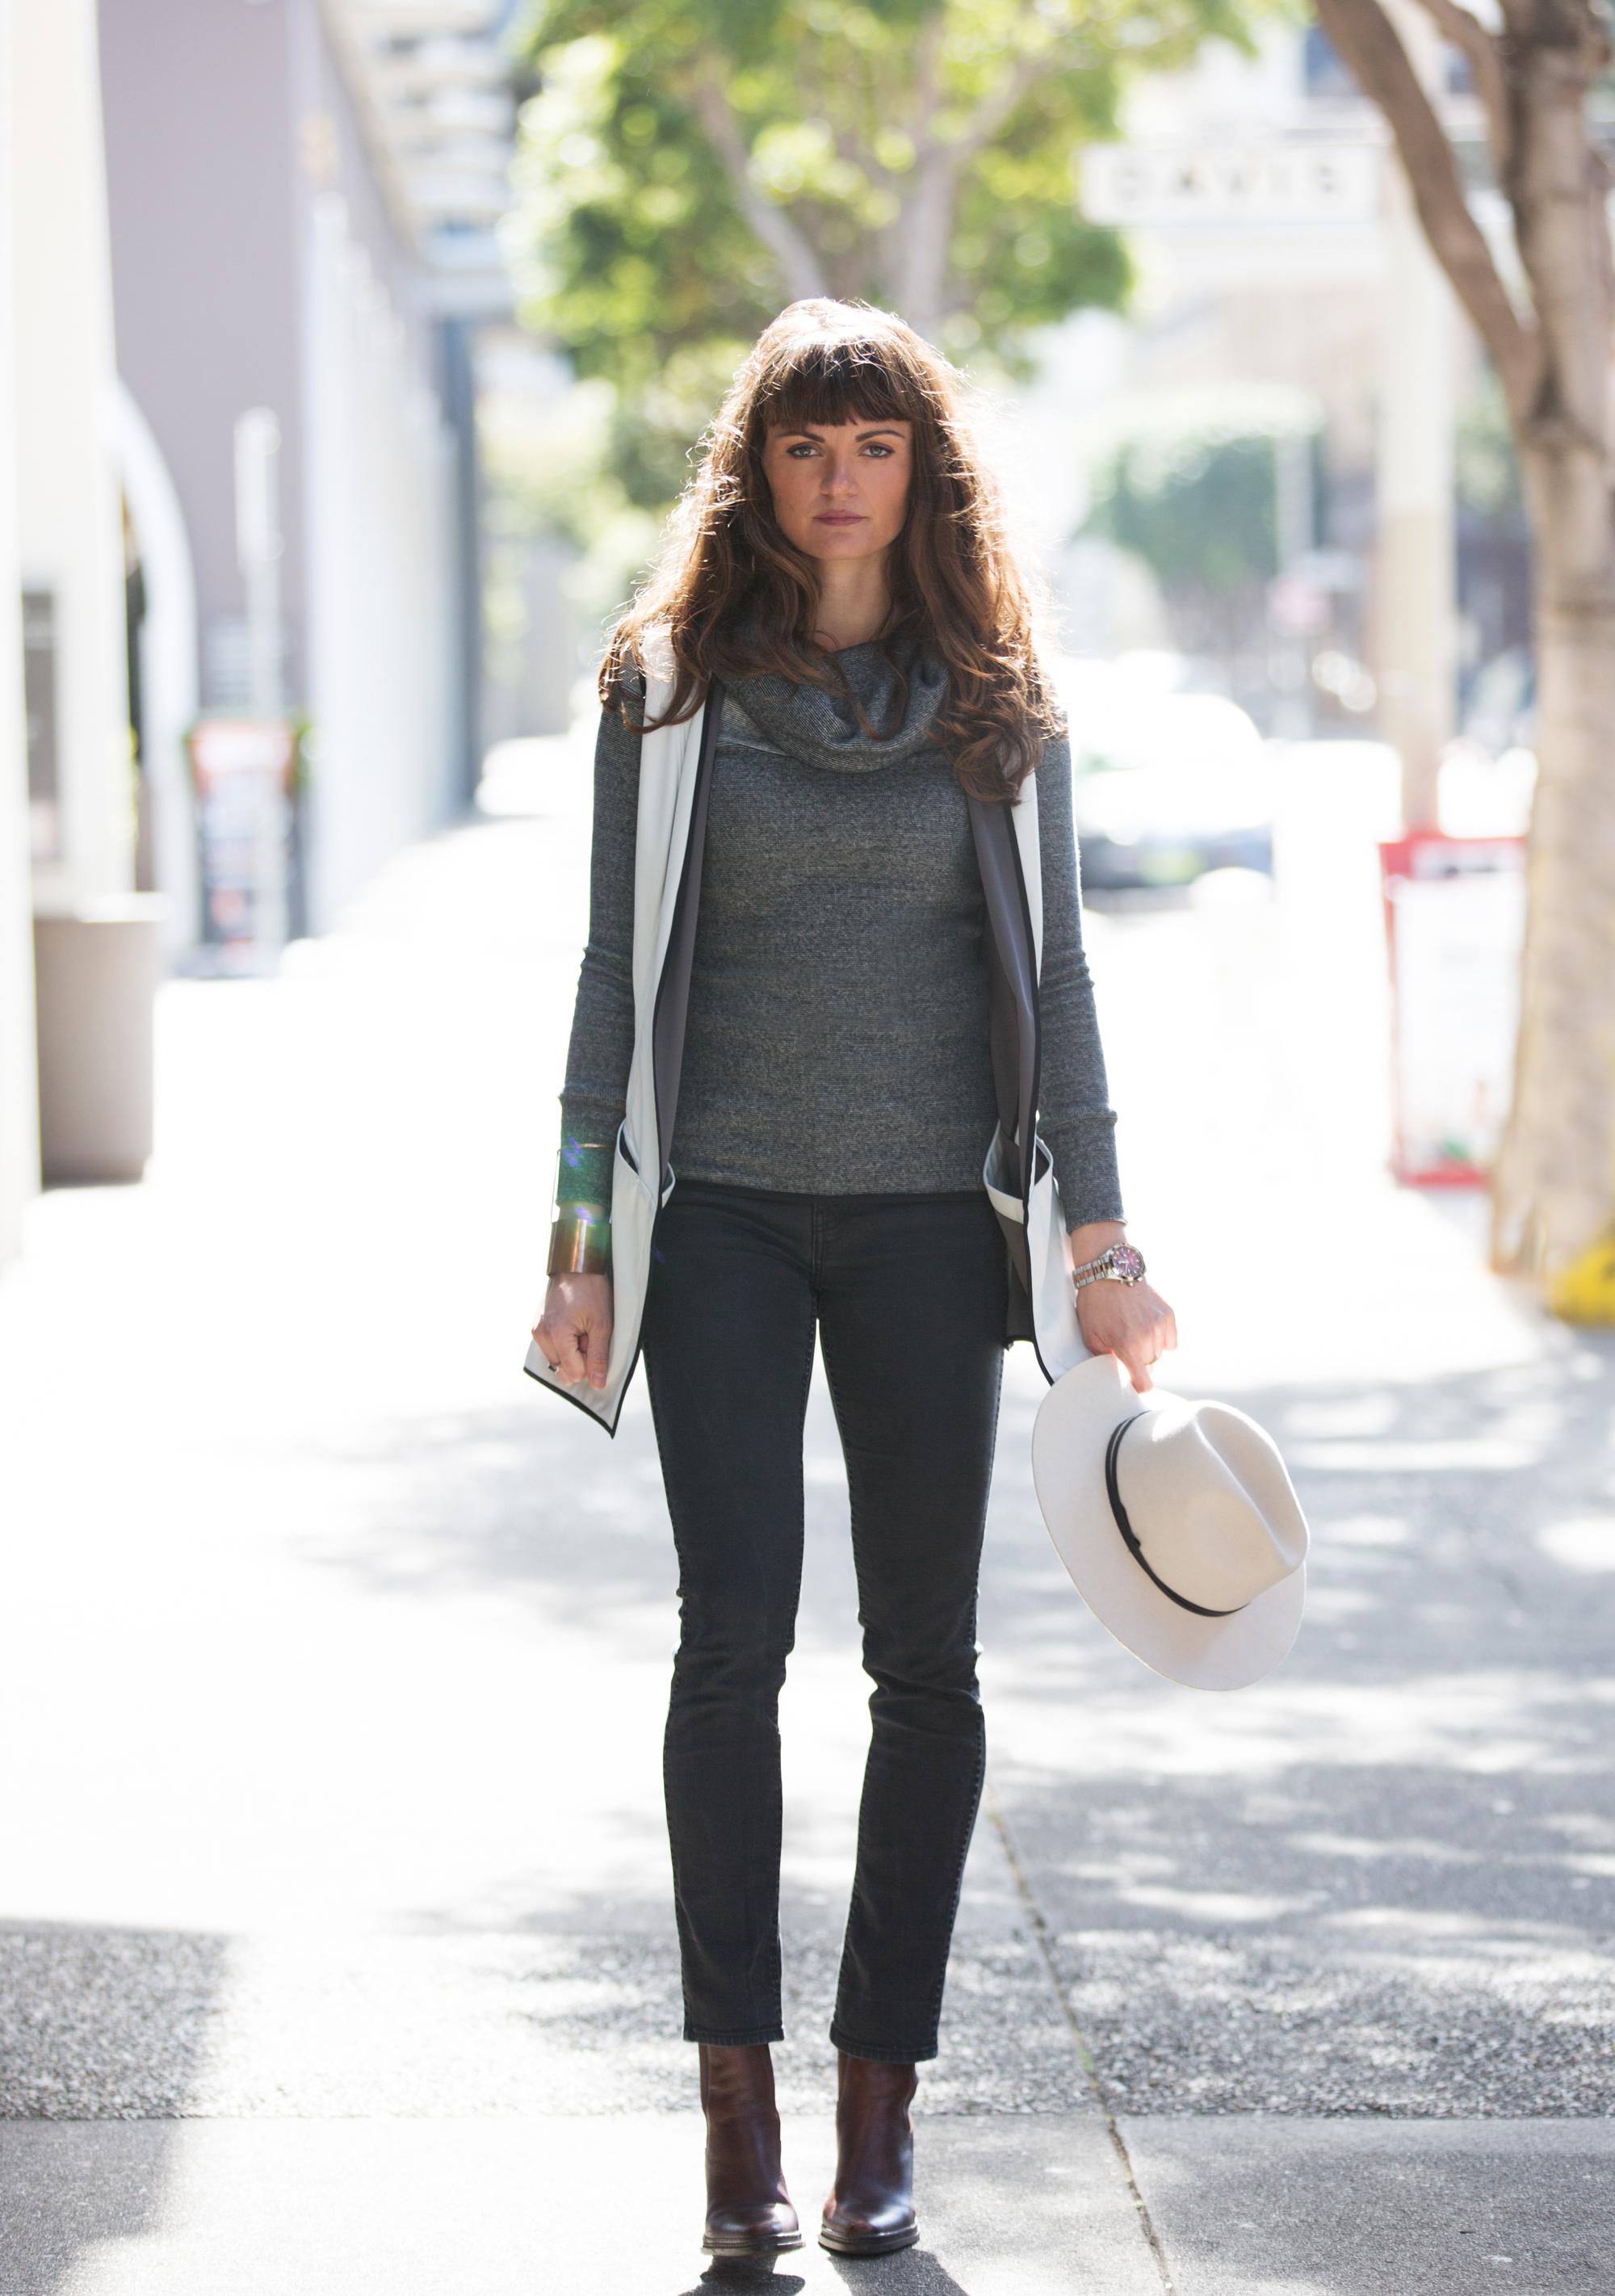 On Maja:  Olivier Sweater  |  K  atya Vest   |  Rogue Hat   |  Manhattan Tote Bag